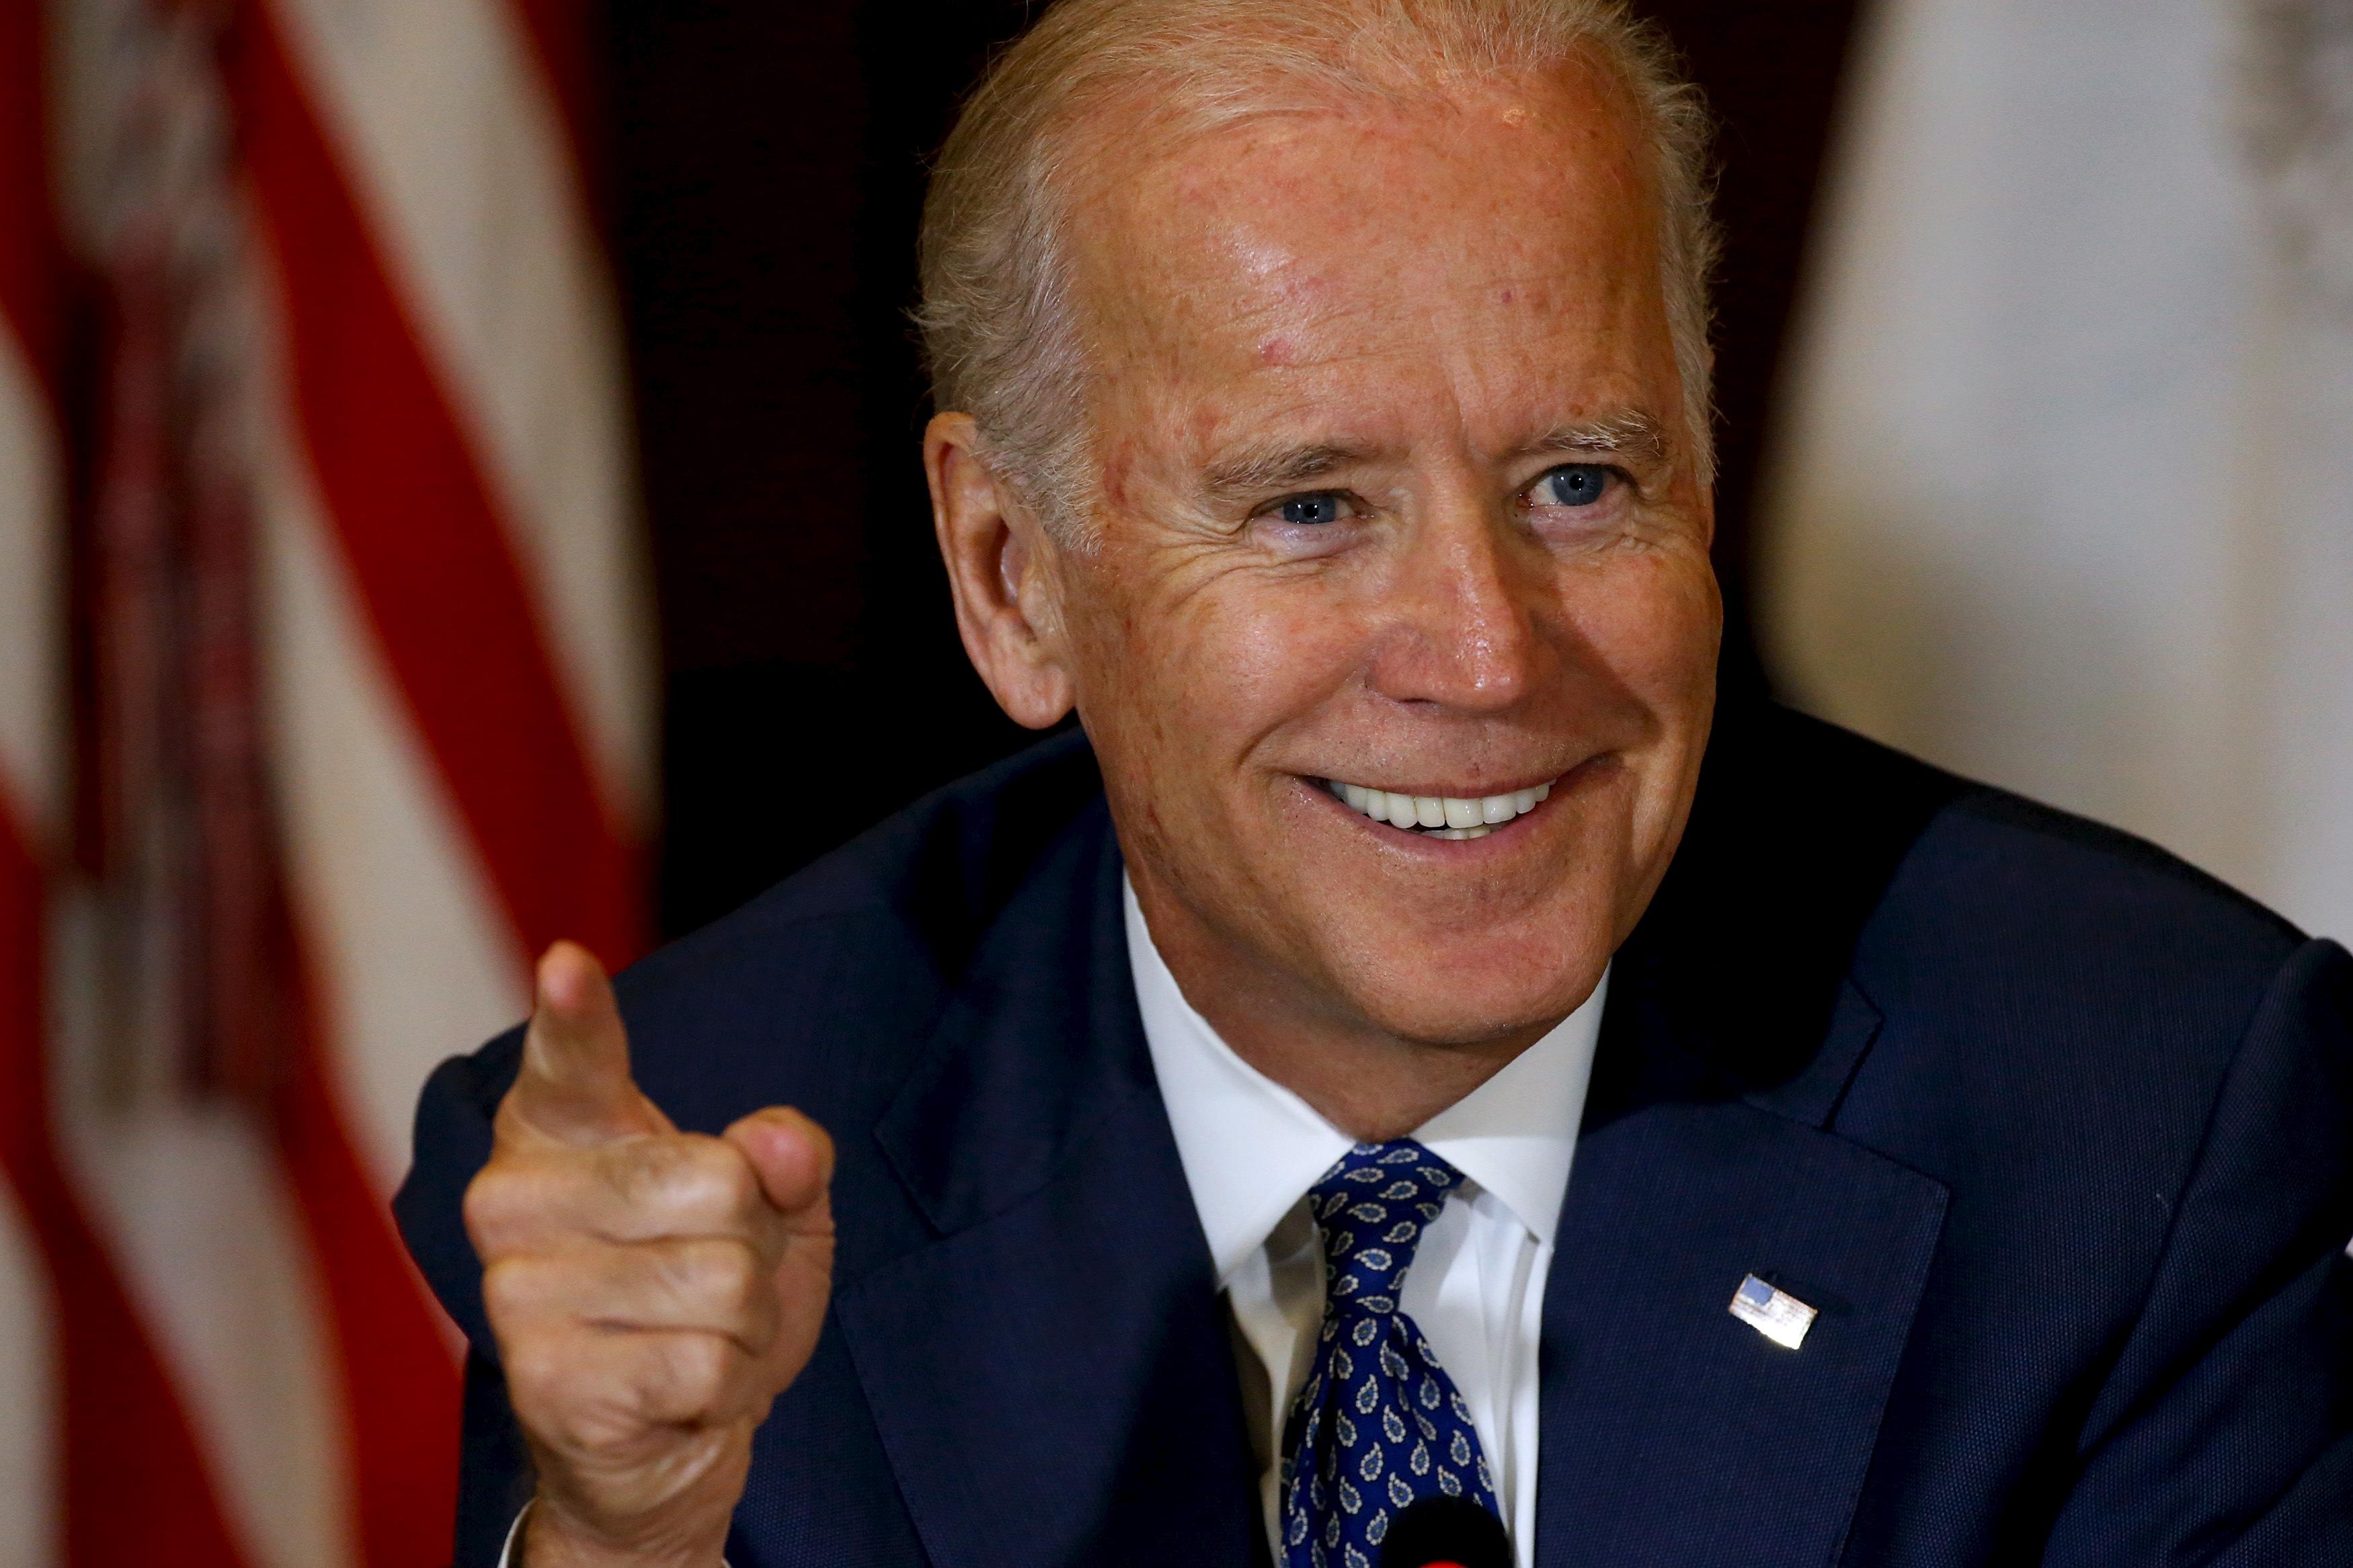 Joe Biden's favorite Obama-Biden meme revealed - CBS News